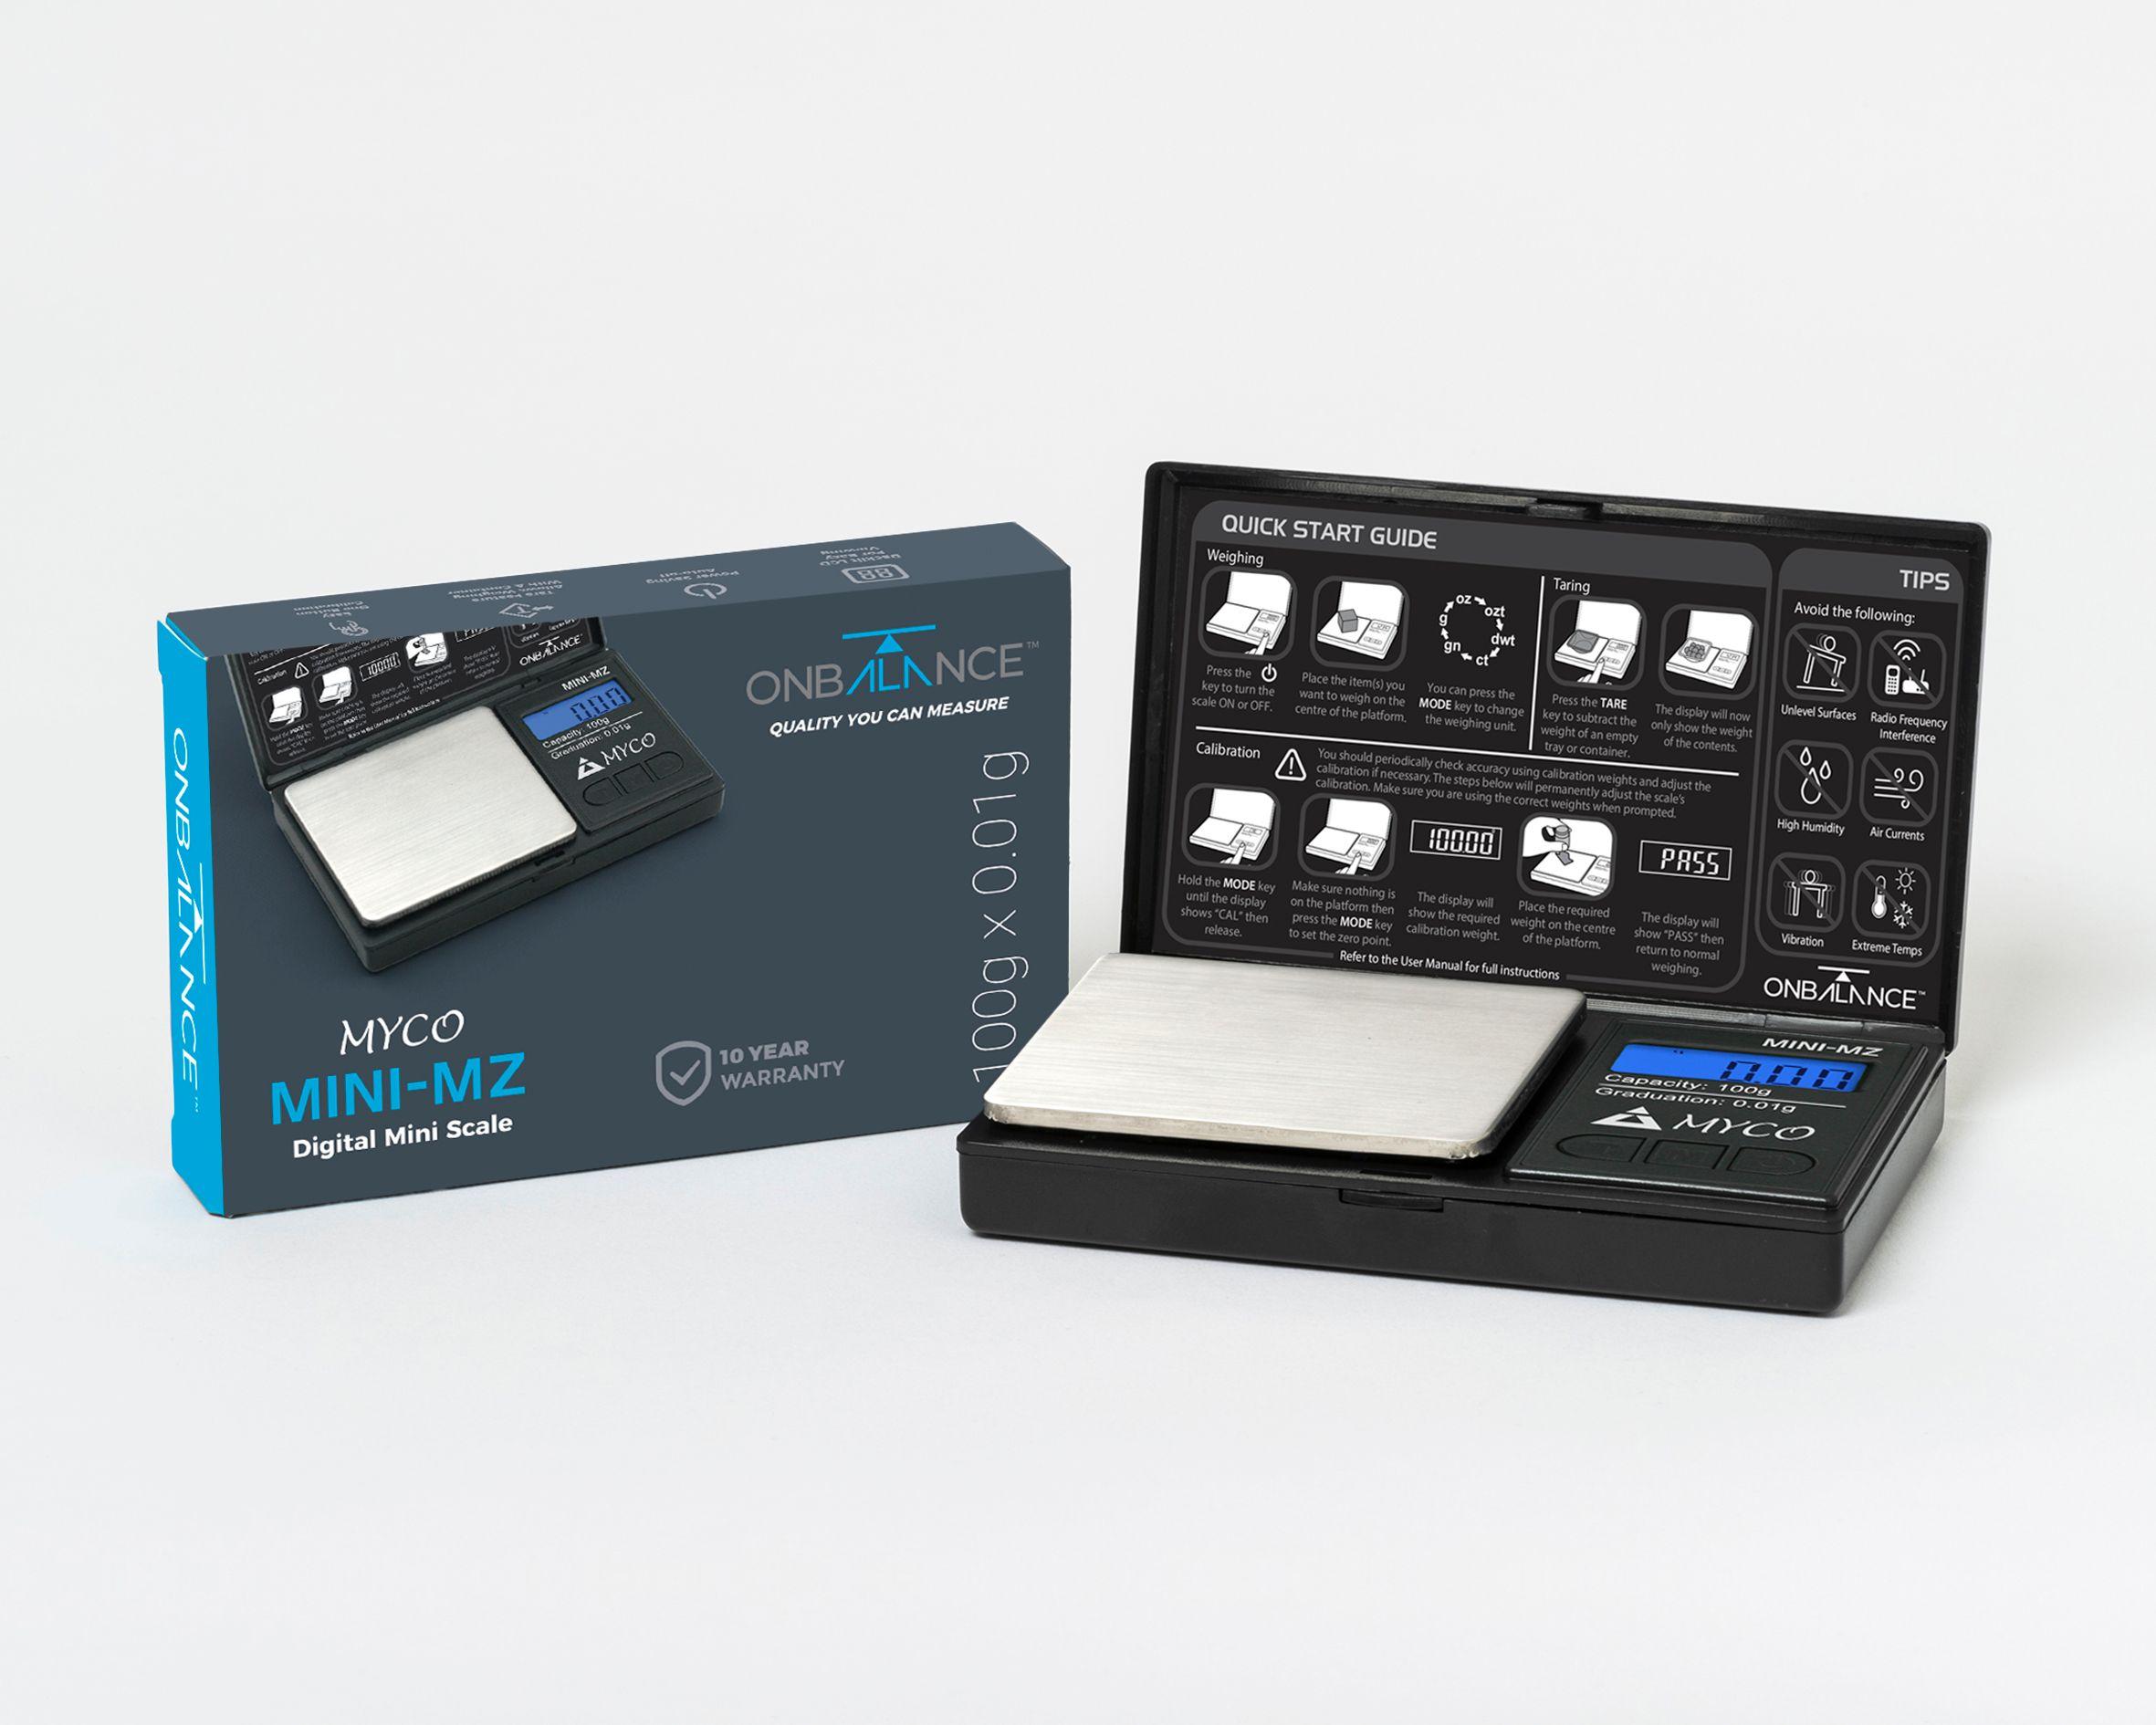 On Balance Myco MINI MZ Scale 100g x 0.01g